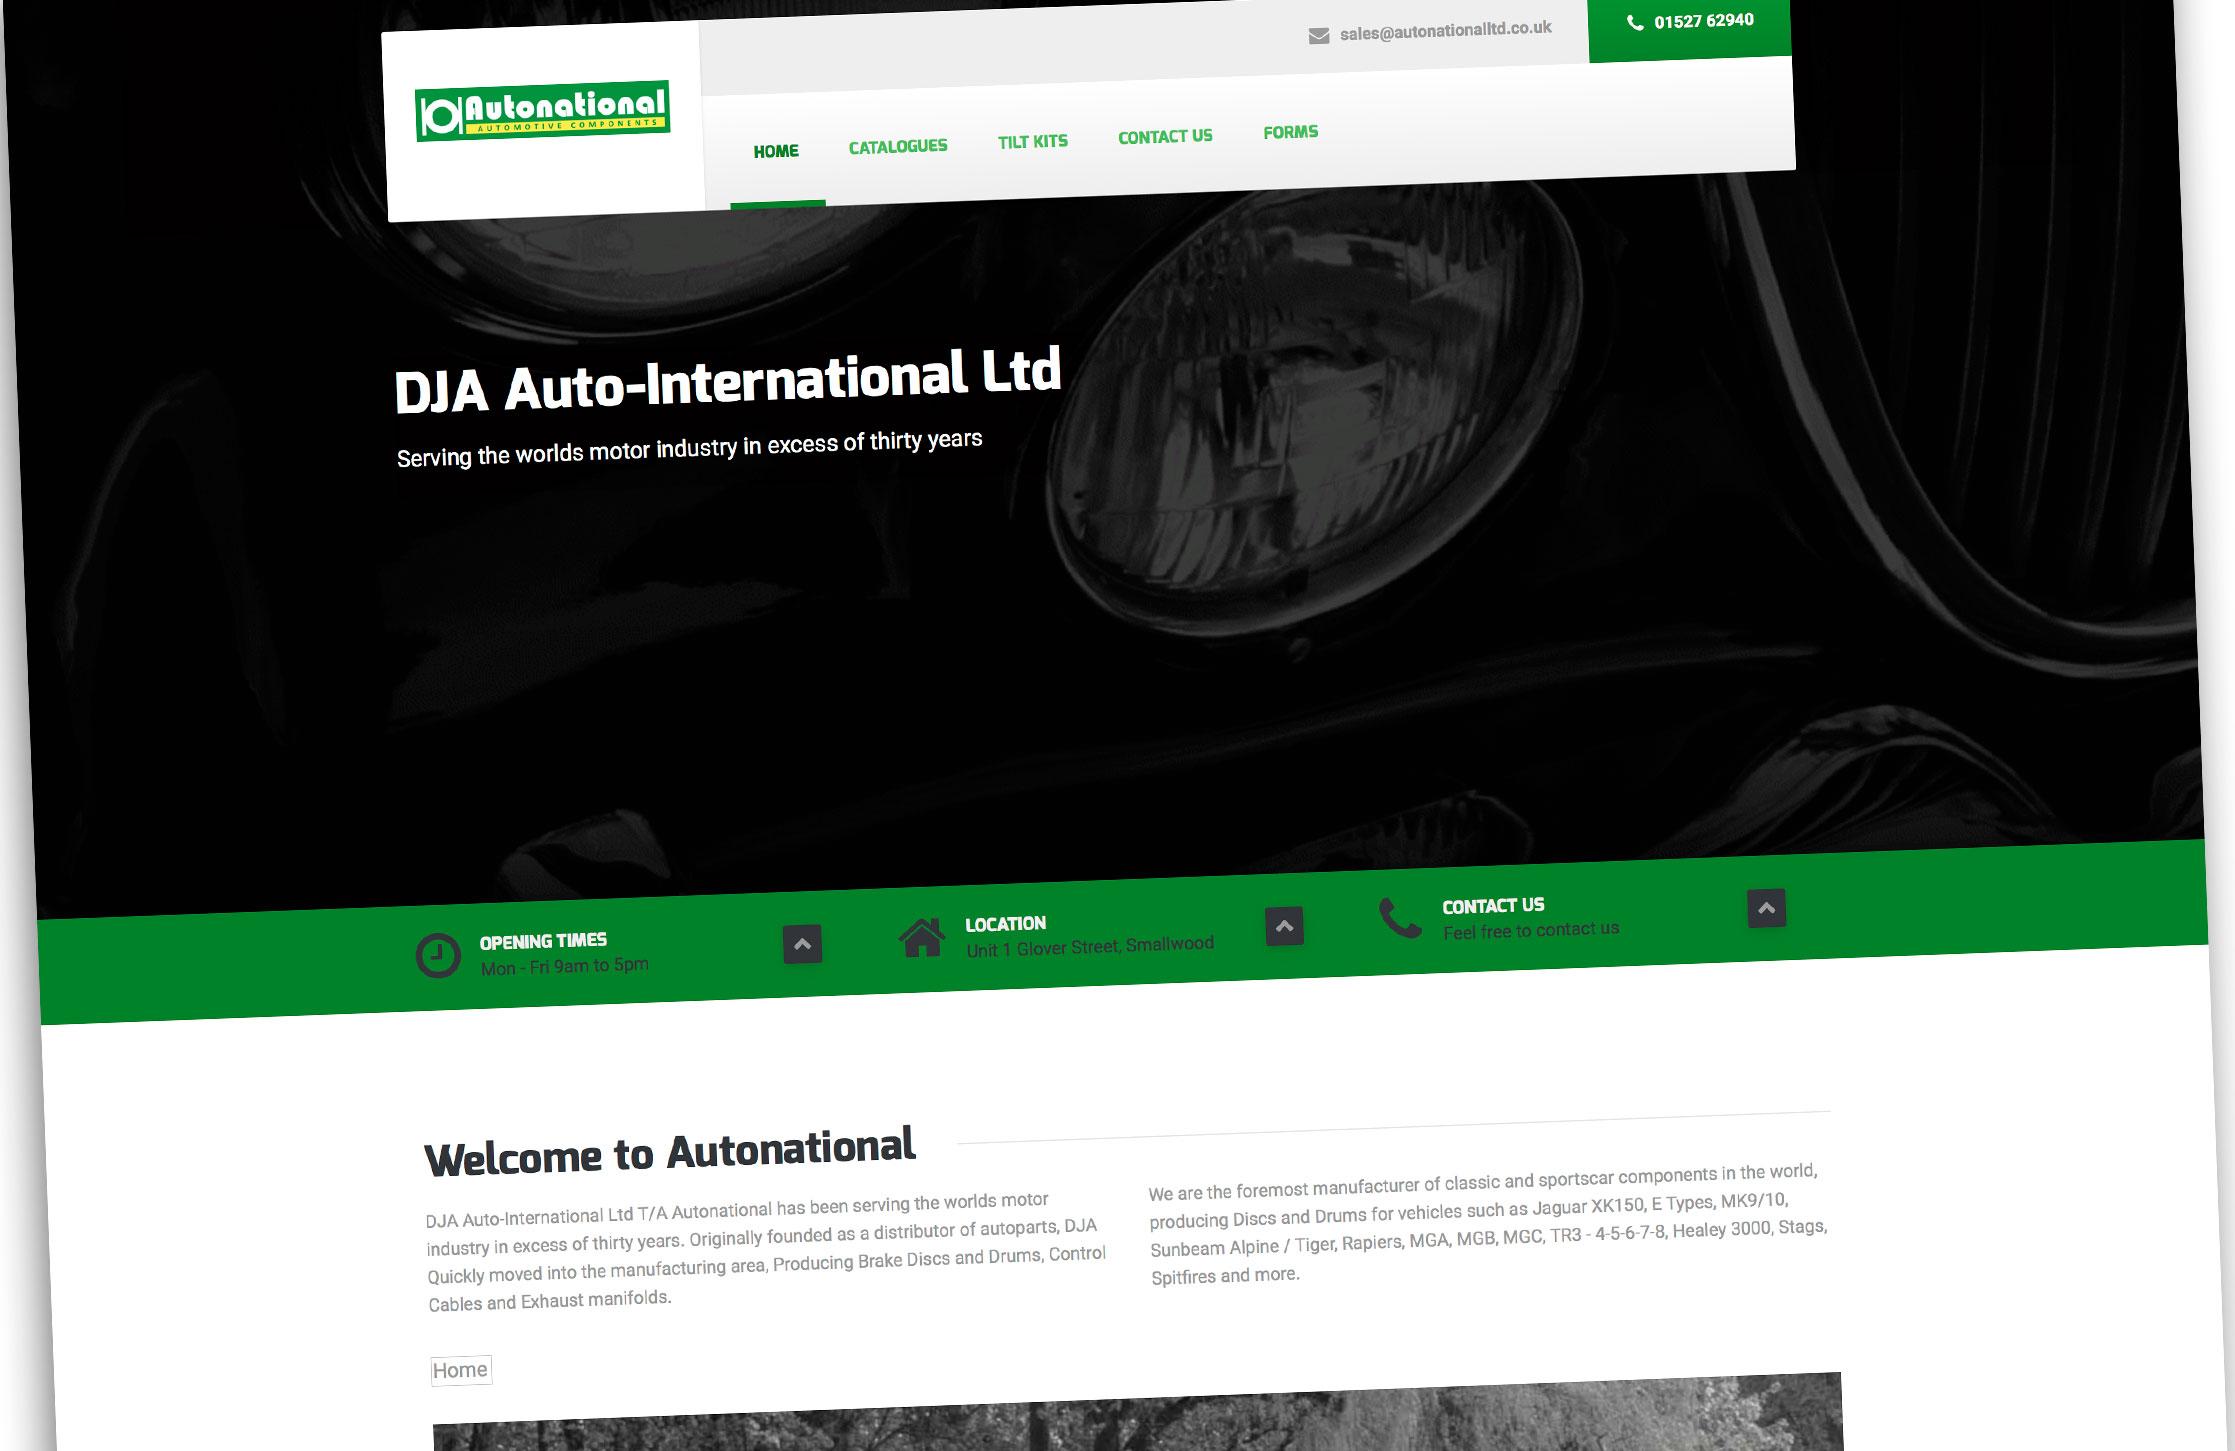 Autonational Motorparts Website